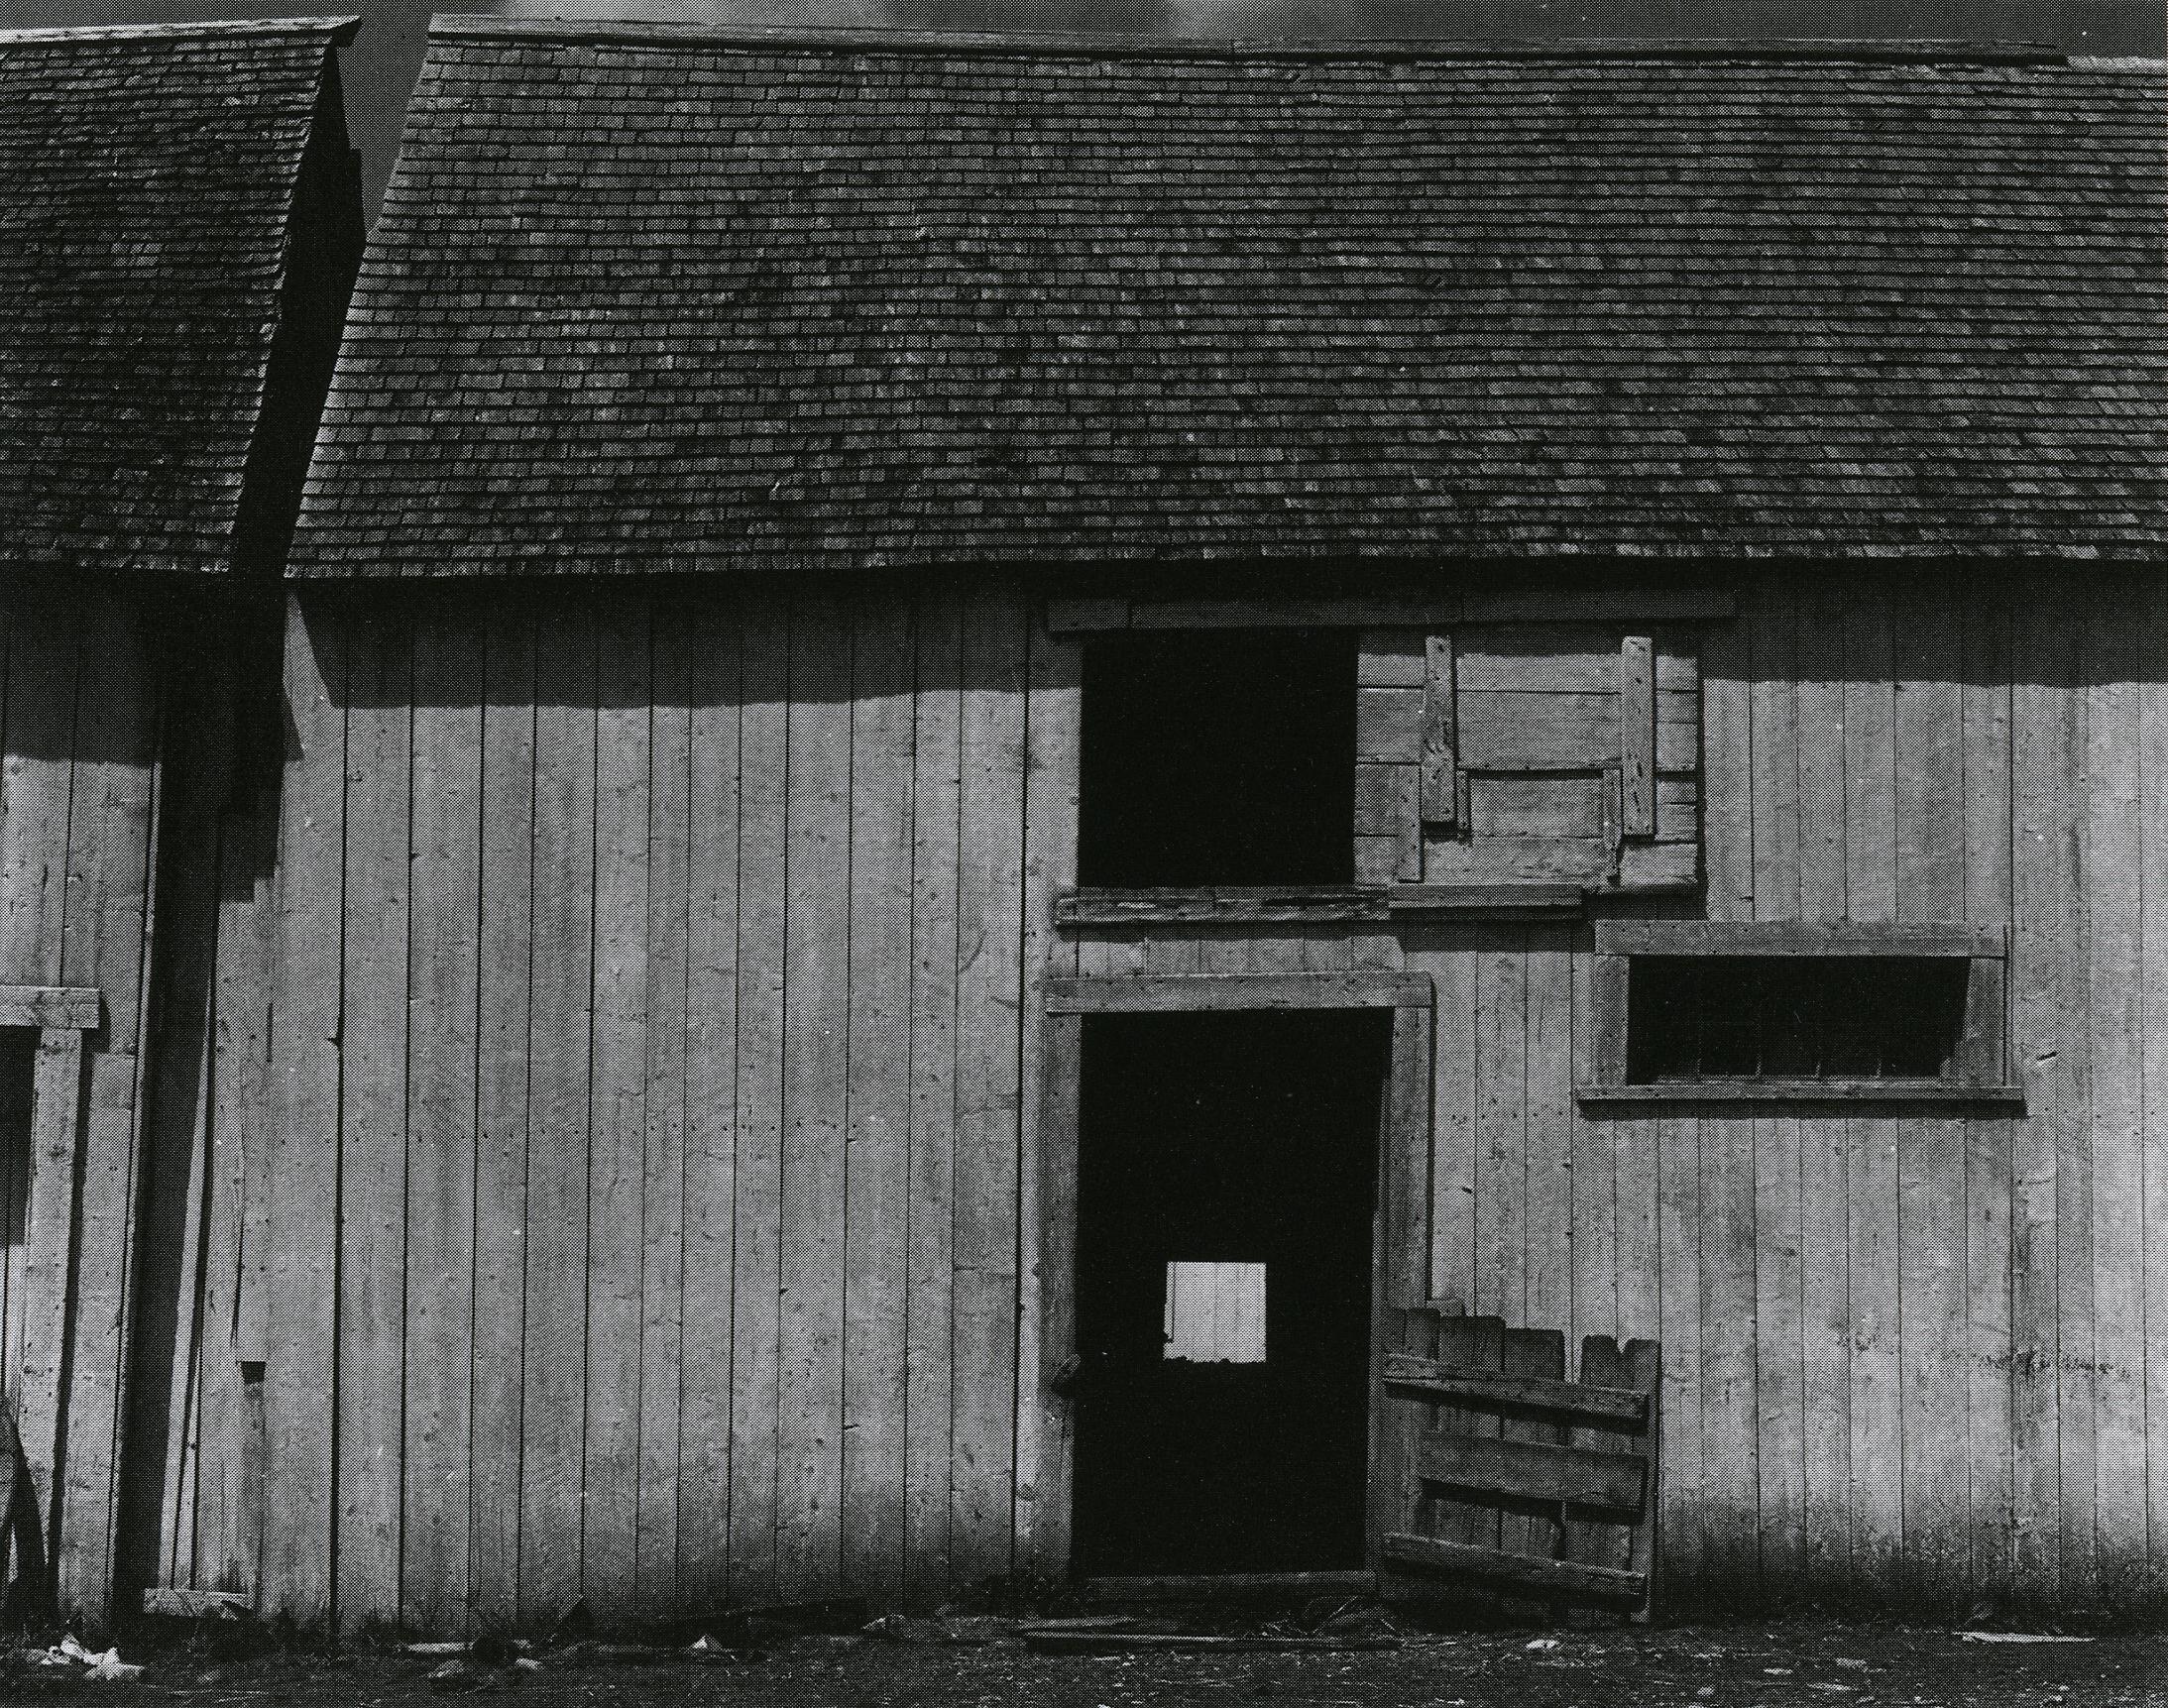 paul strand_grange, Gaspé, 1936_p70